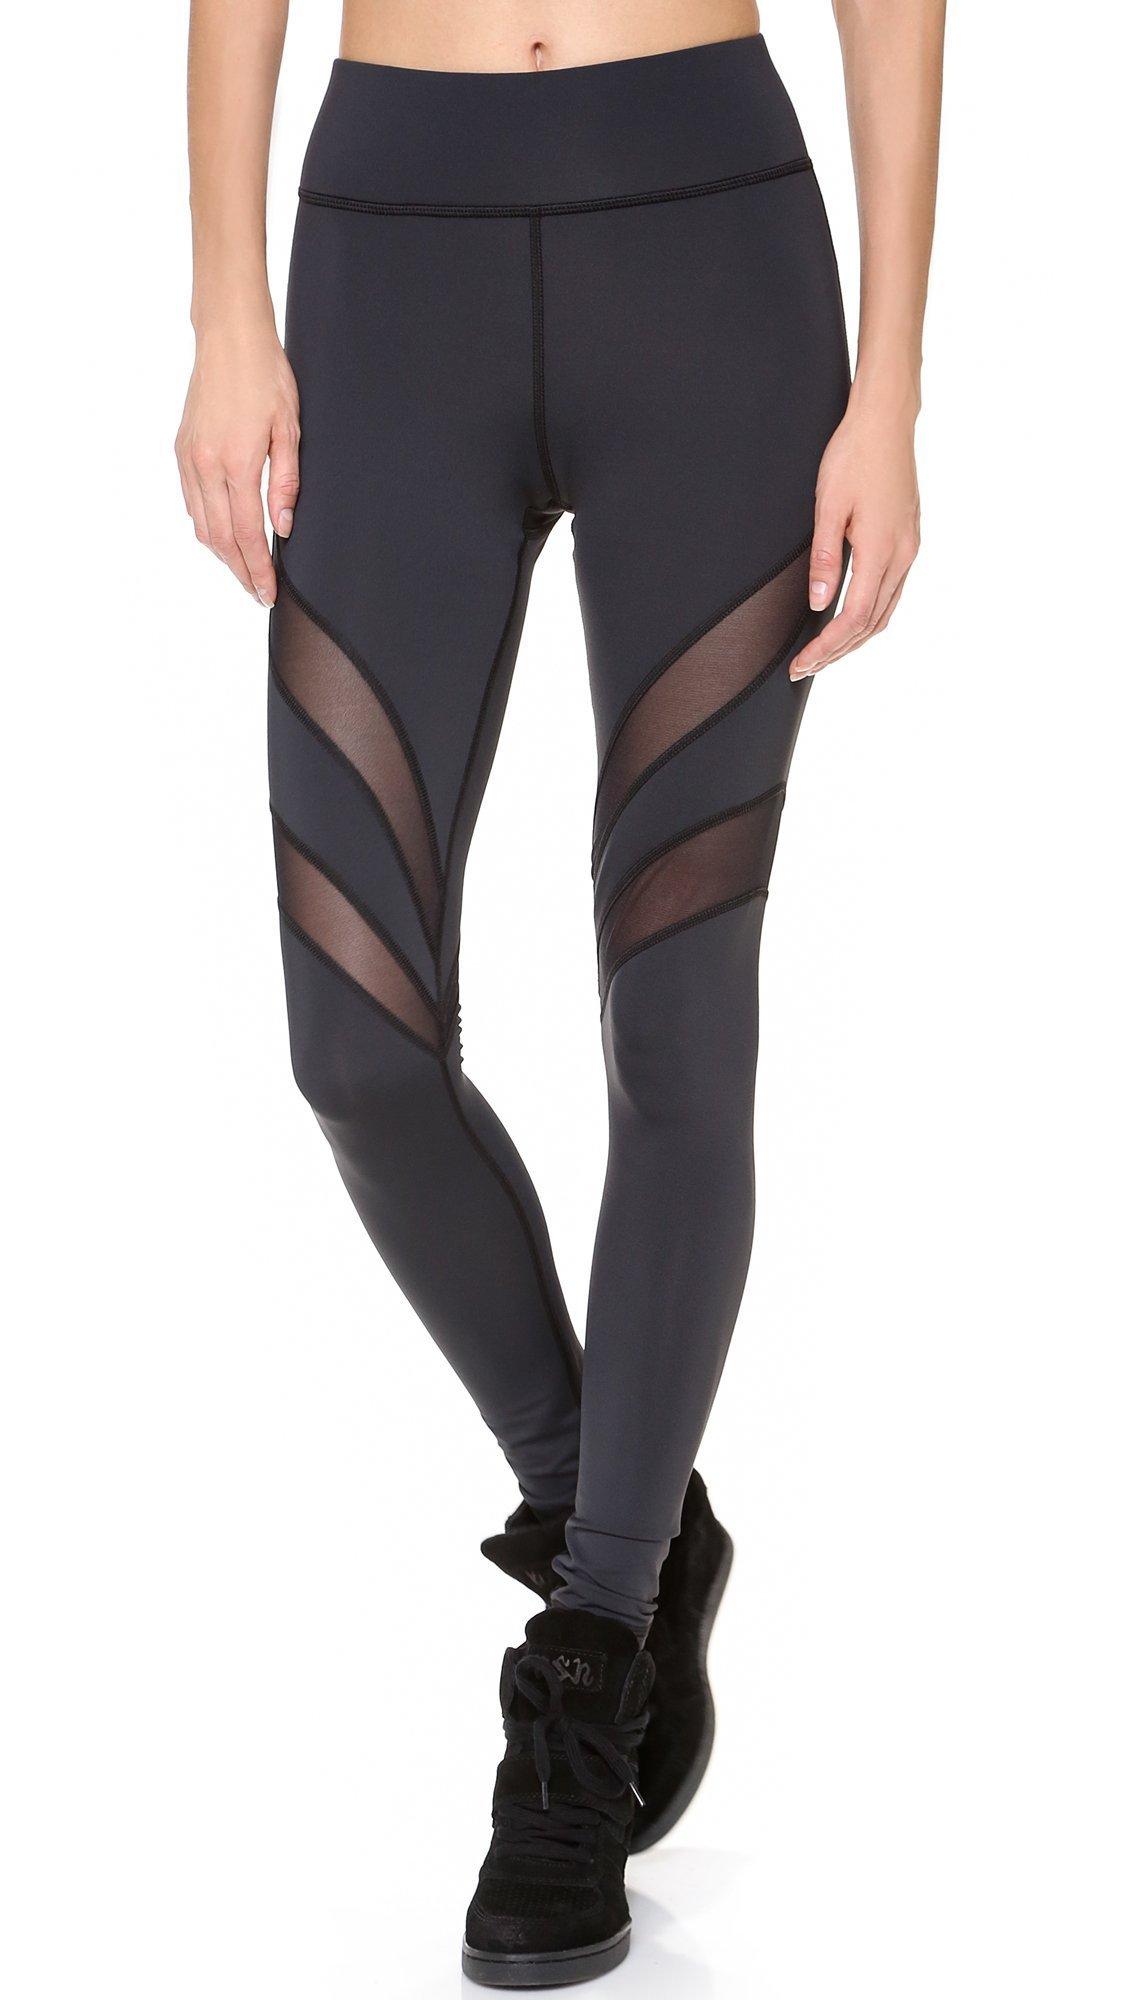 MICHI Women's Psyche Leggings, Black, Large